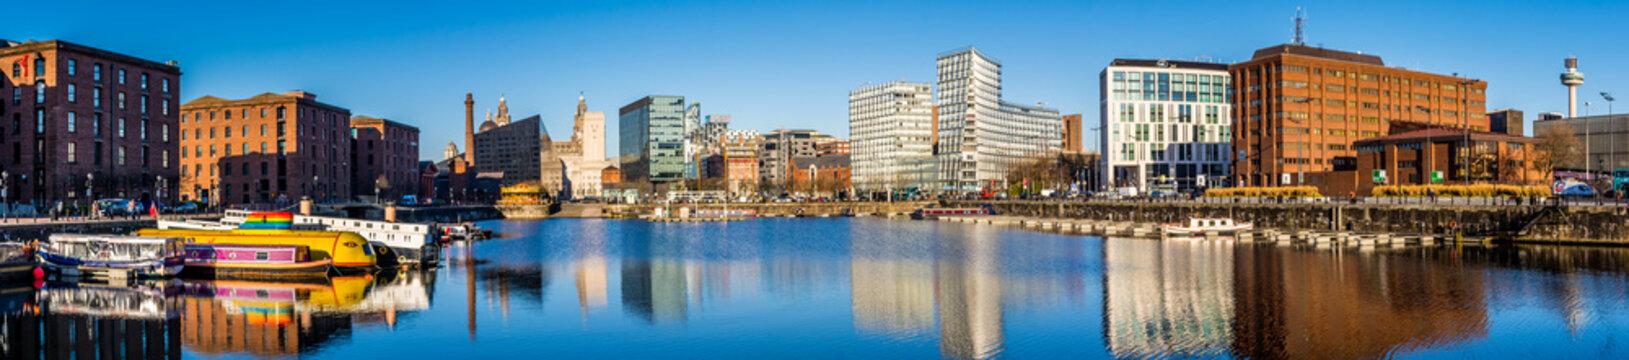 Salthouse Dock Liverpool